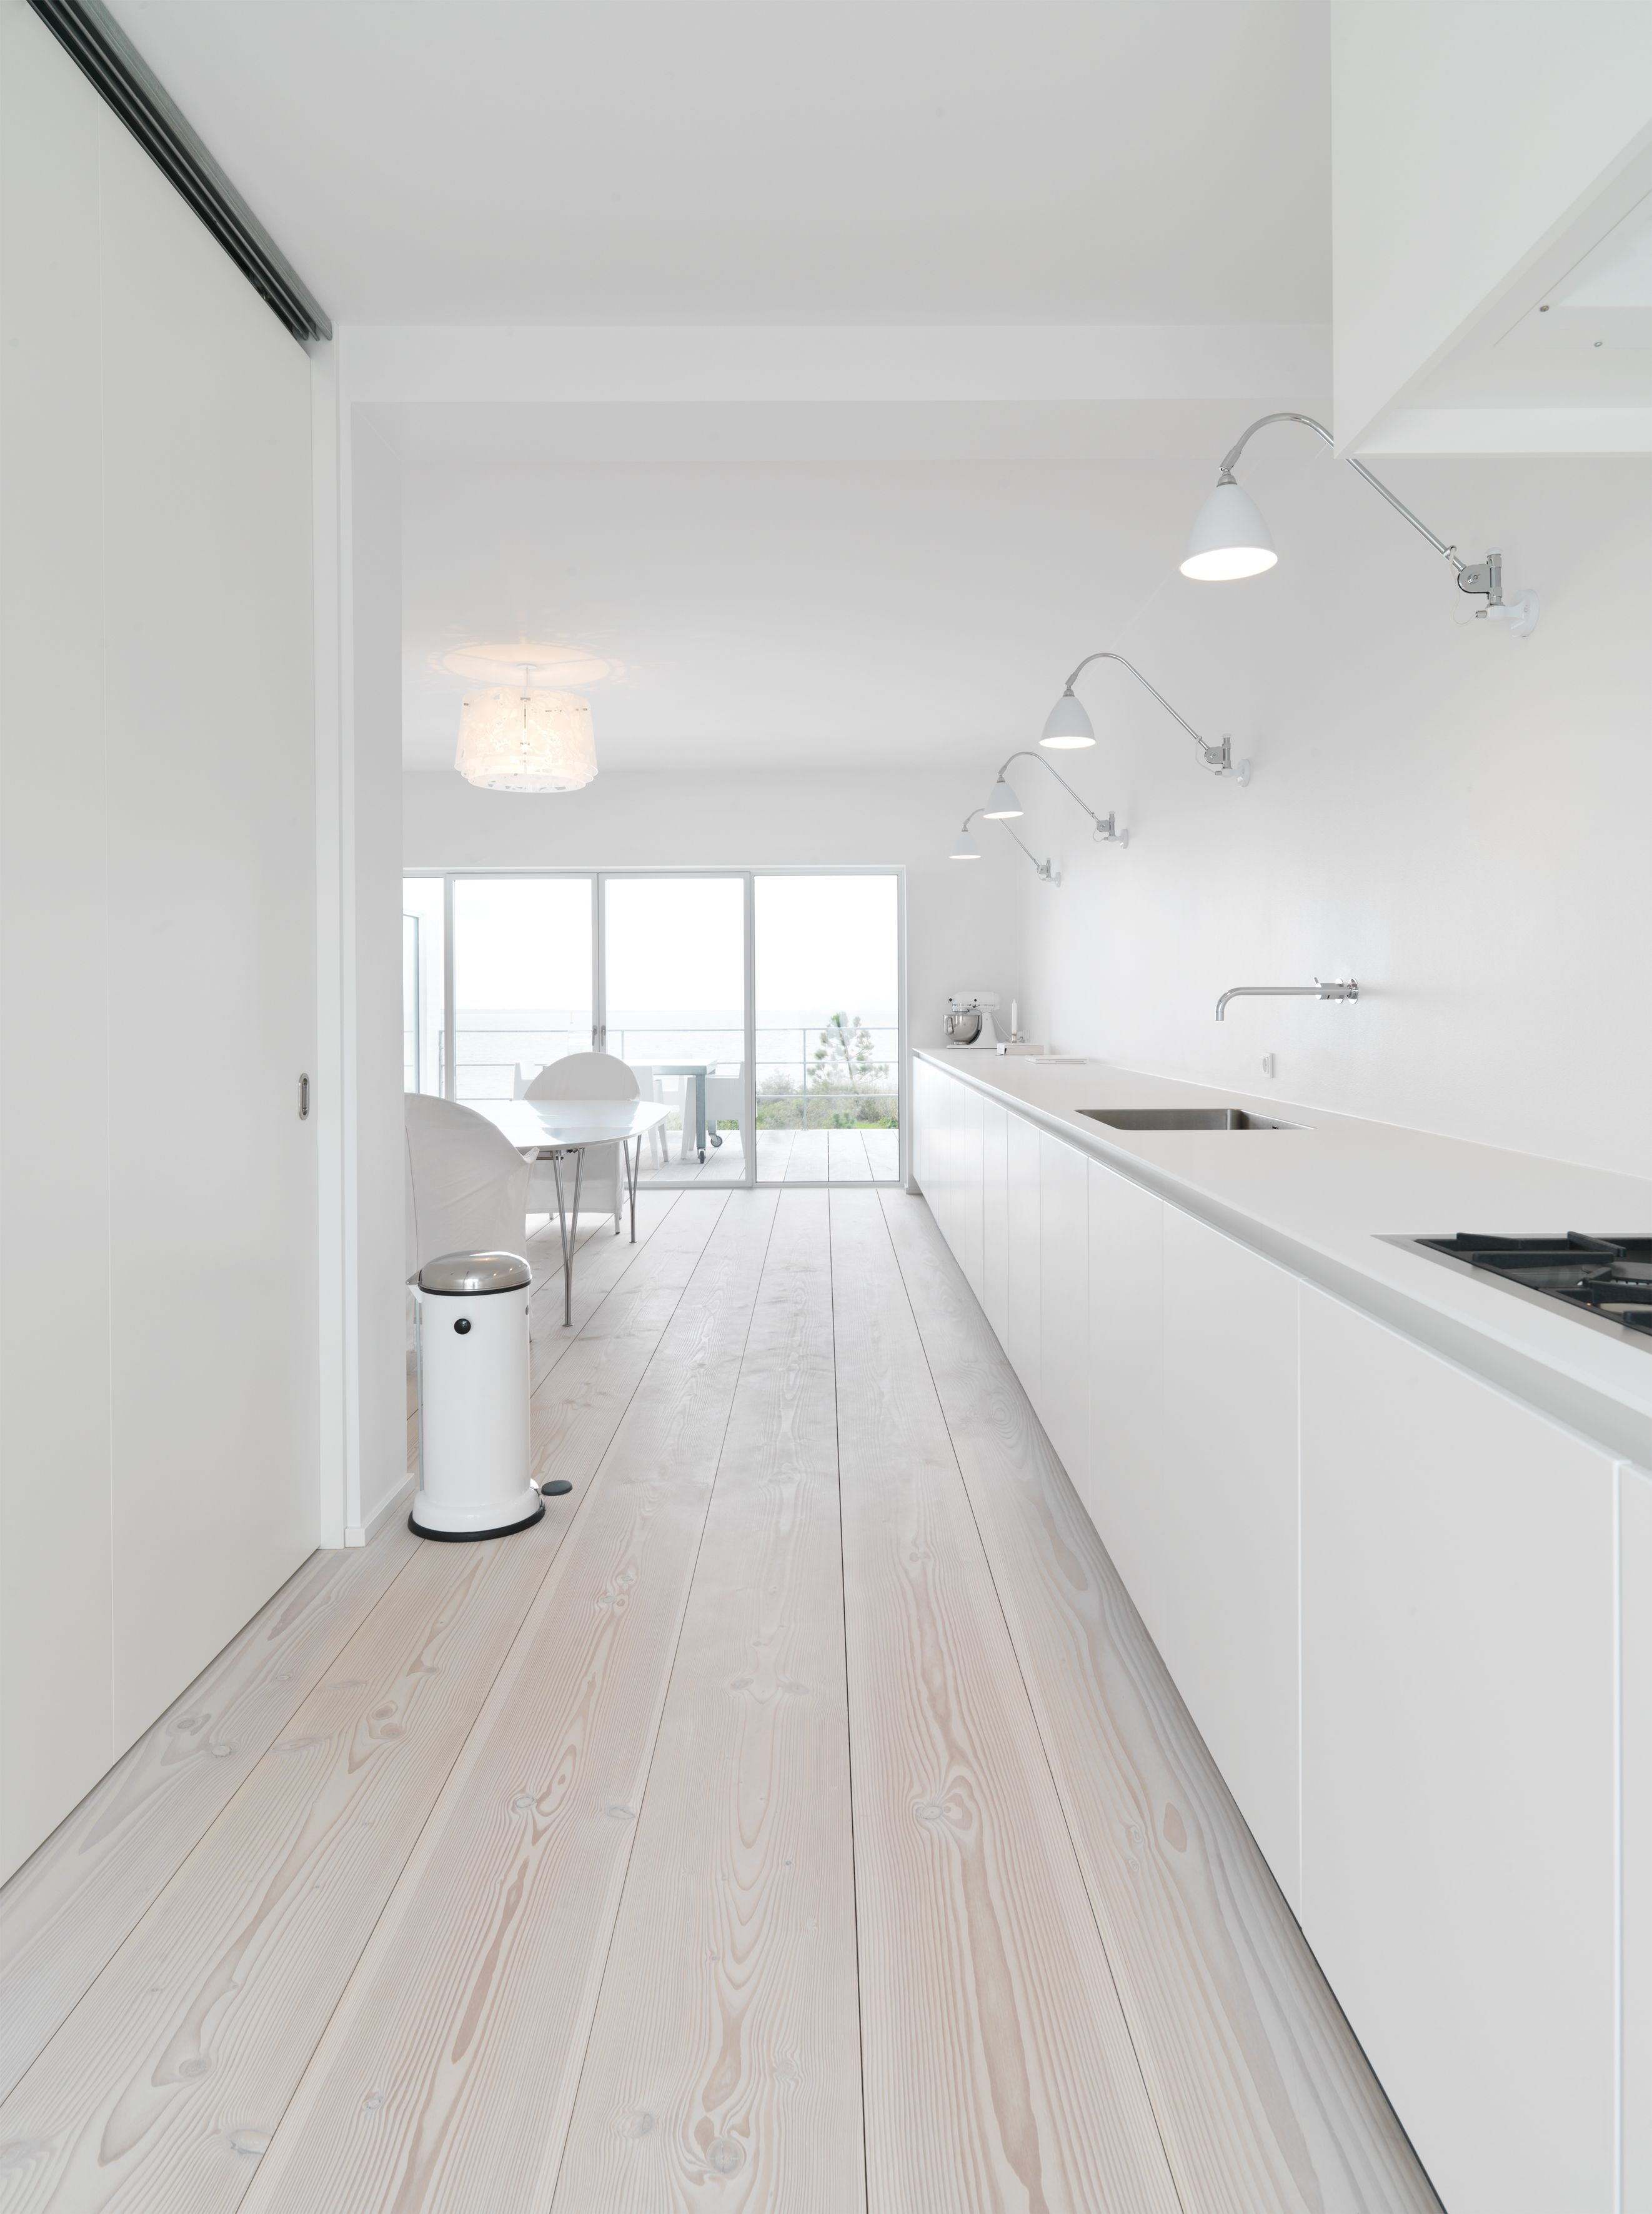 Bulthaup Kitchen All Kept In White With Douglas 30 Cm Wide Planks Keuken Ontwerpen Keuken Greeploos Keuken Vloeren